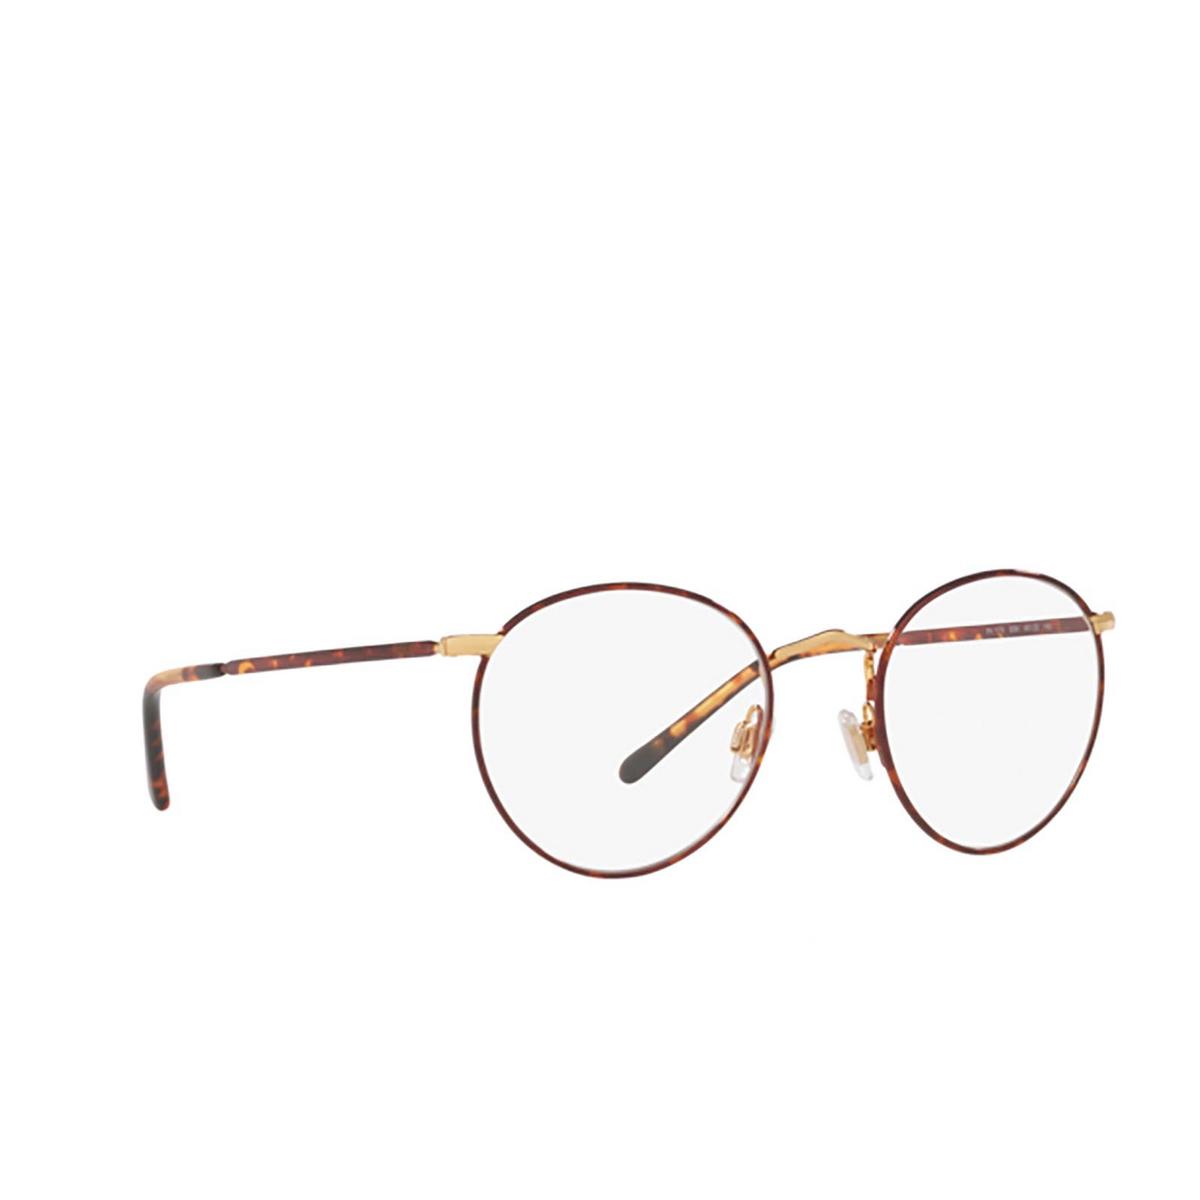 Polo Ralph Lauren® Round Eyeglasses: PH1179 color Havana On Shiny Gold 9384 - three-quarters view.